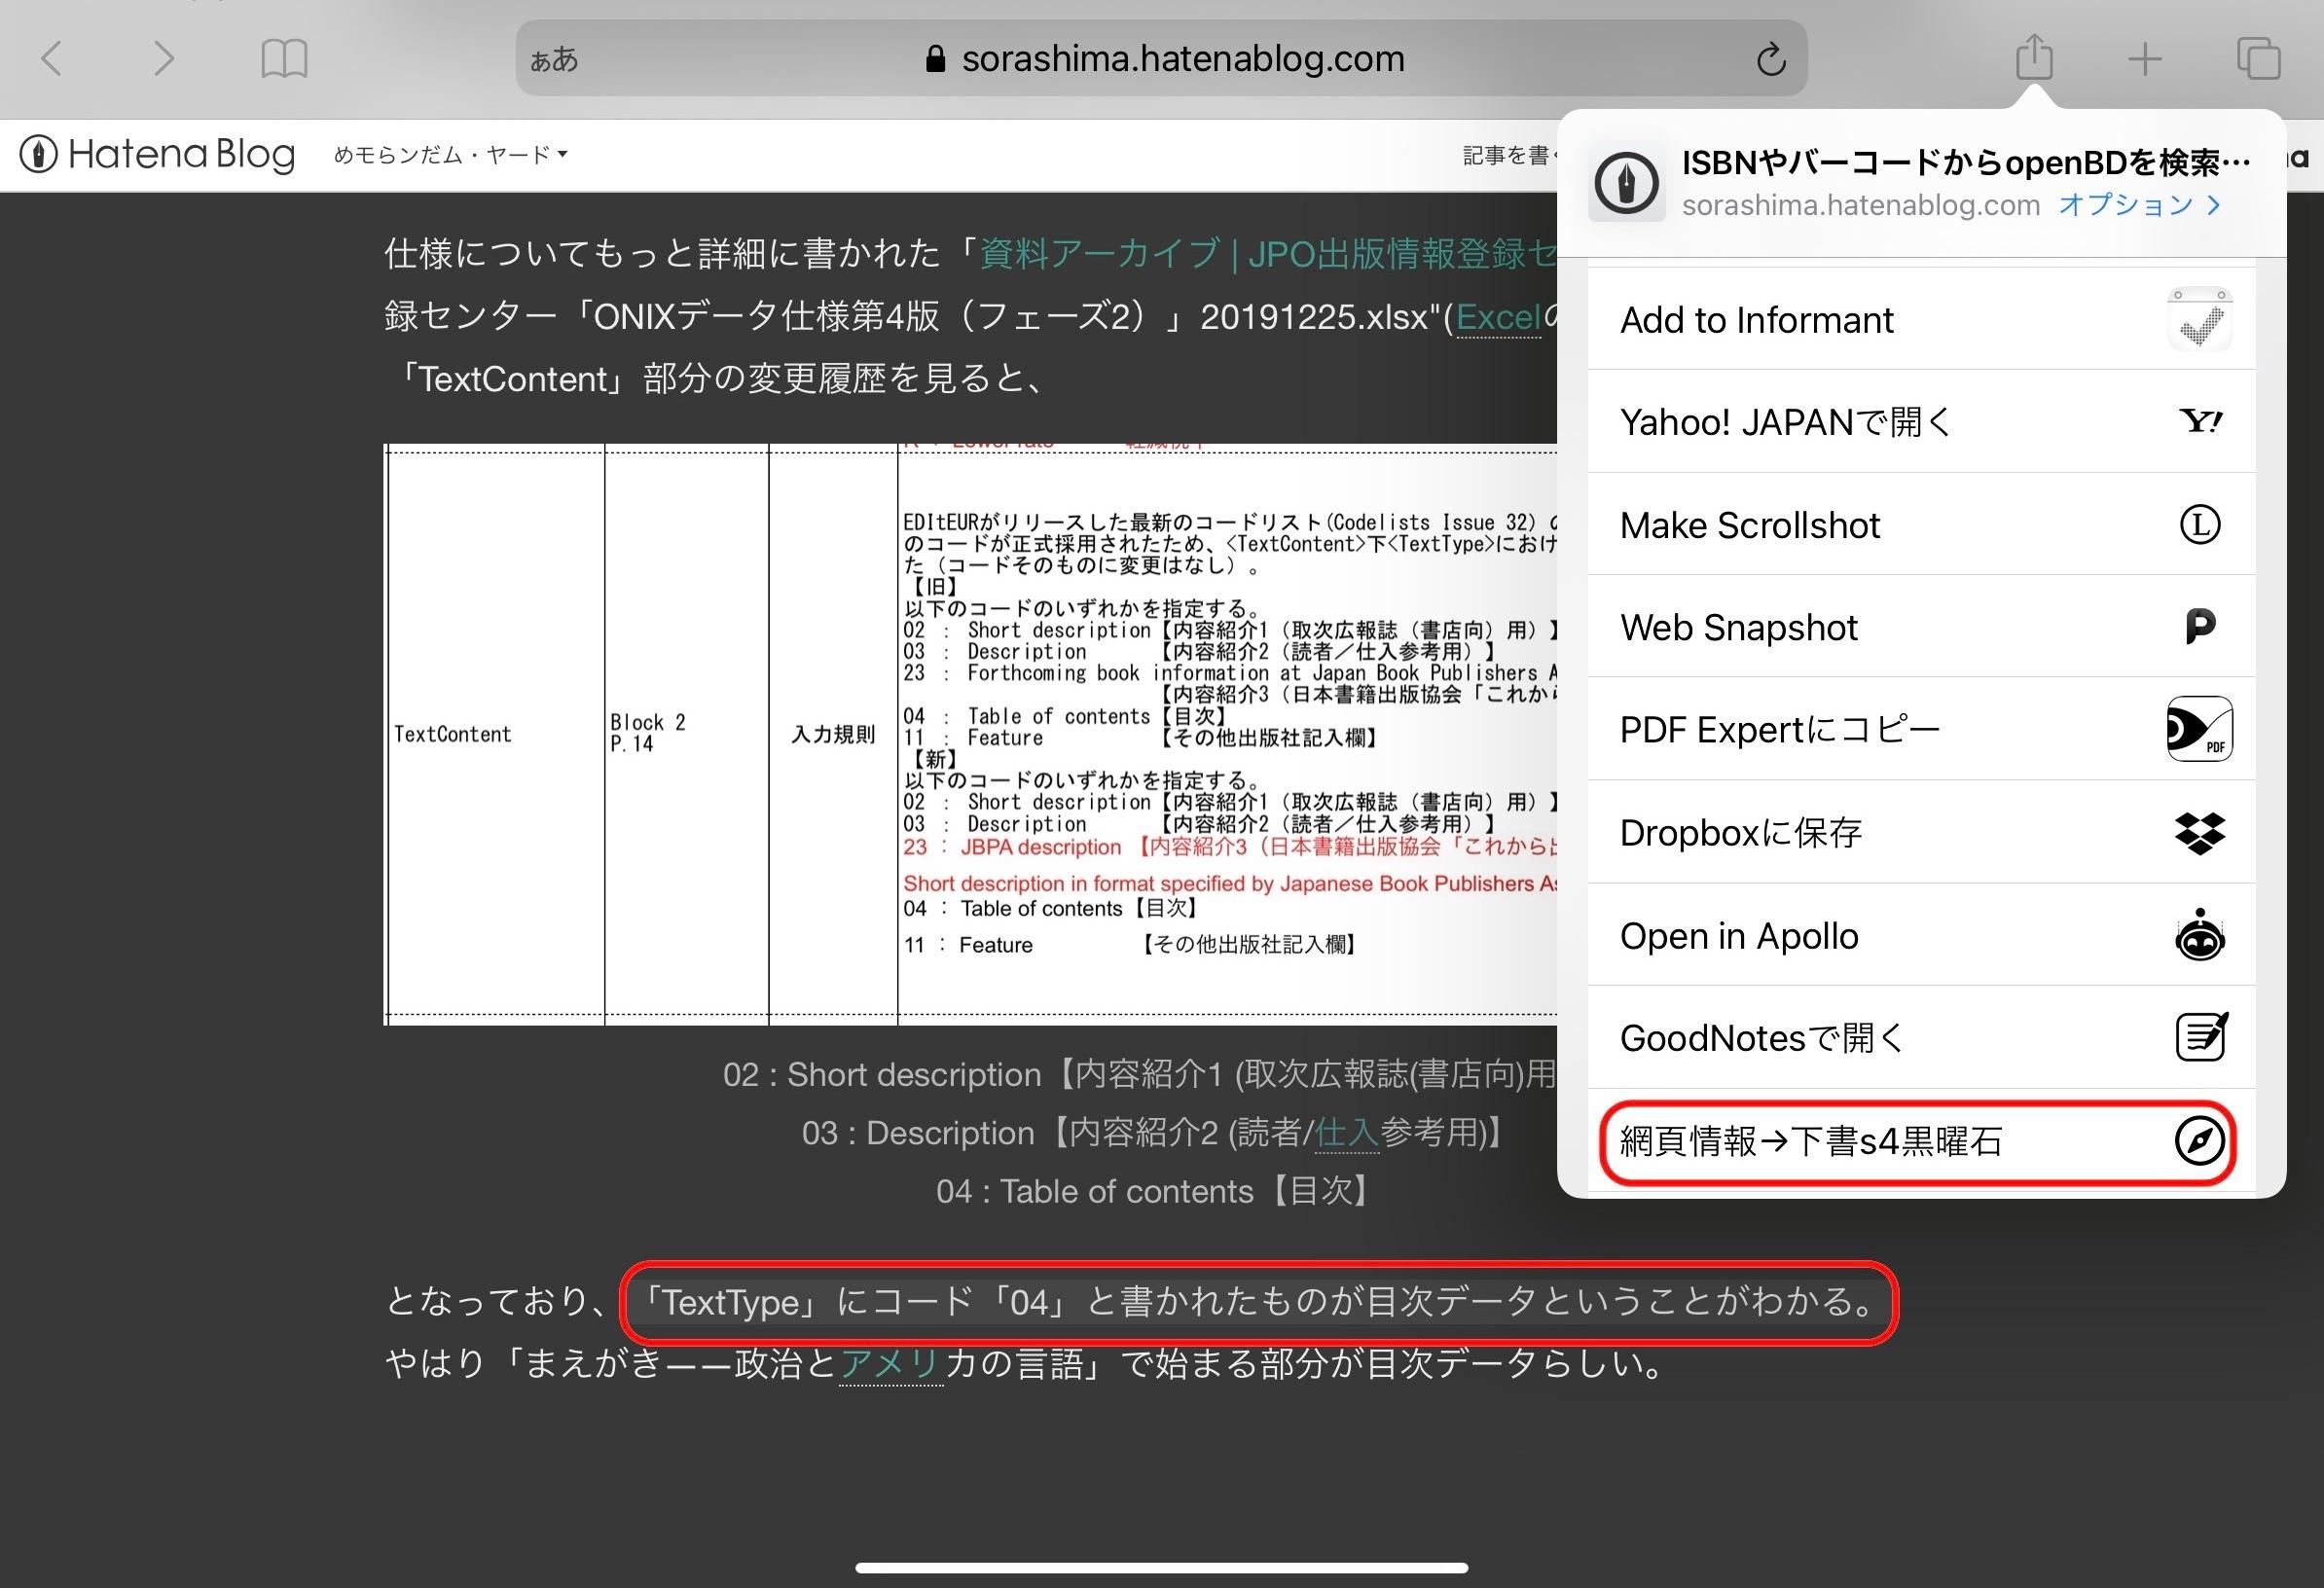 f:id:sorashima:20210702192258j:plain:w990